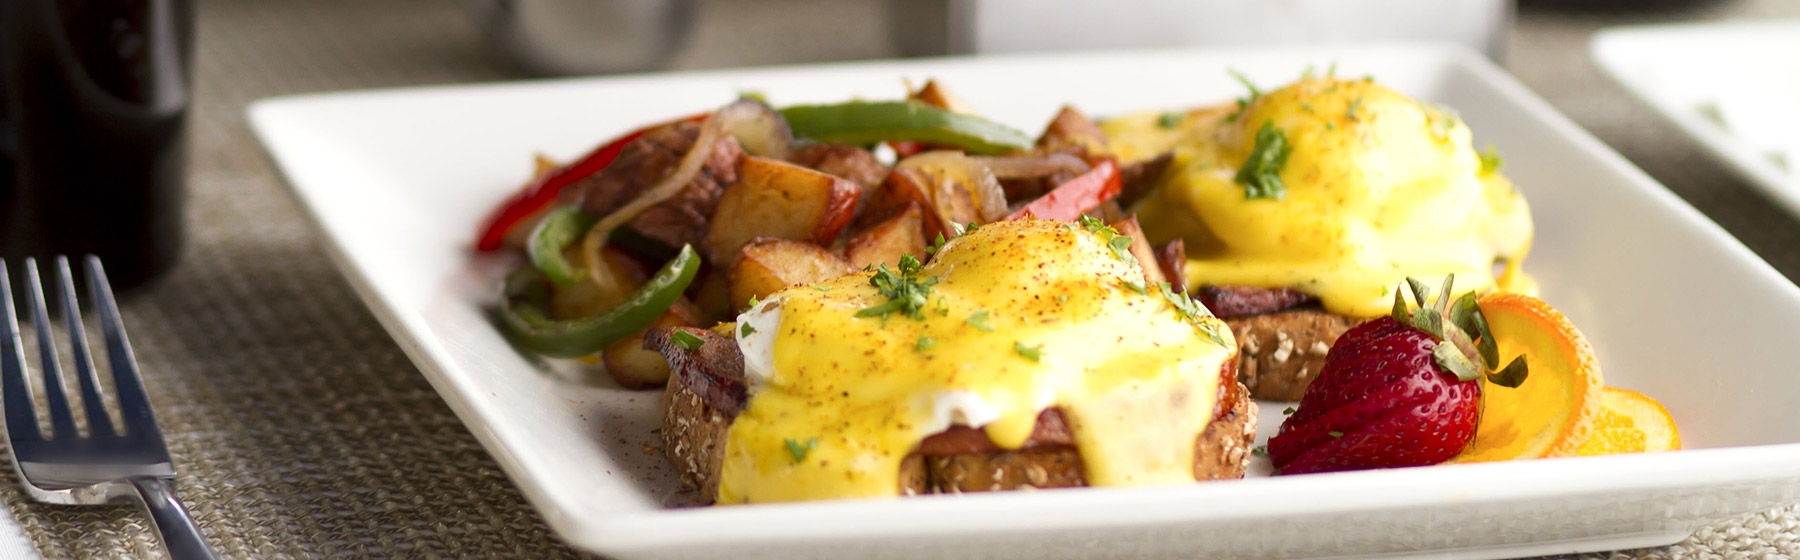 Enjoy Corporate Breakfast at Ellis Hotel, Atlanta